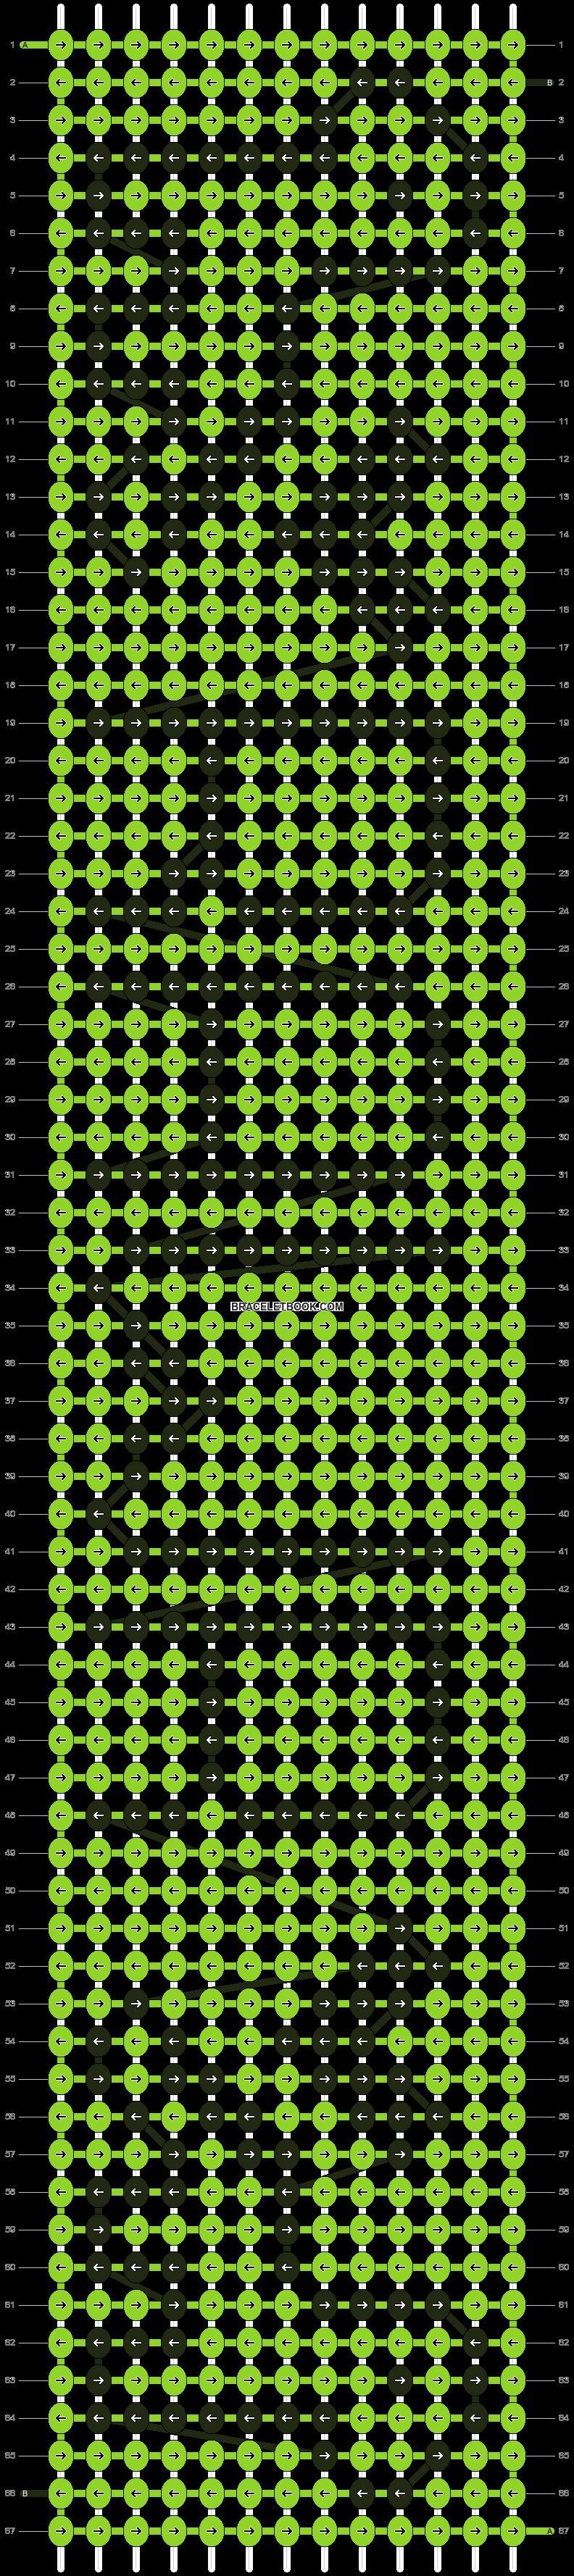 Alpha pattern #16485 pattern